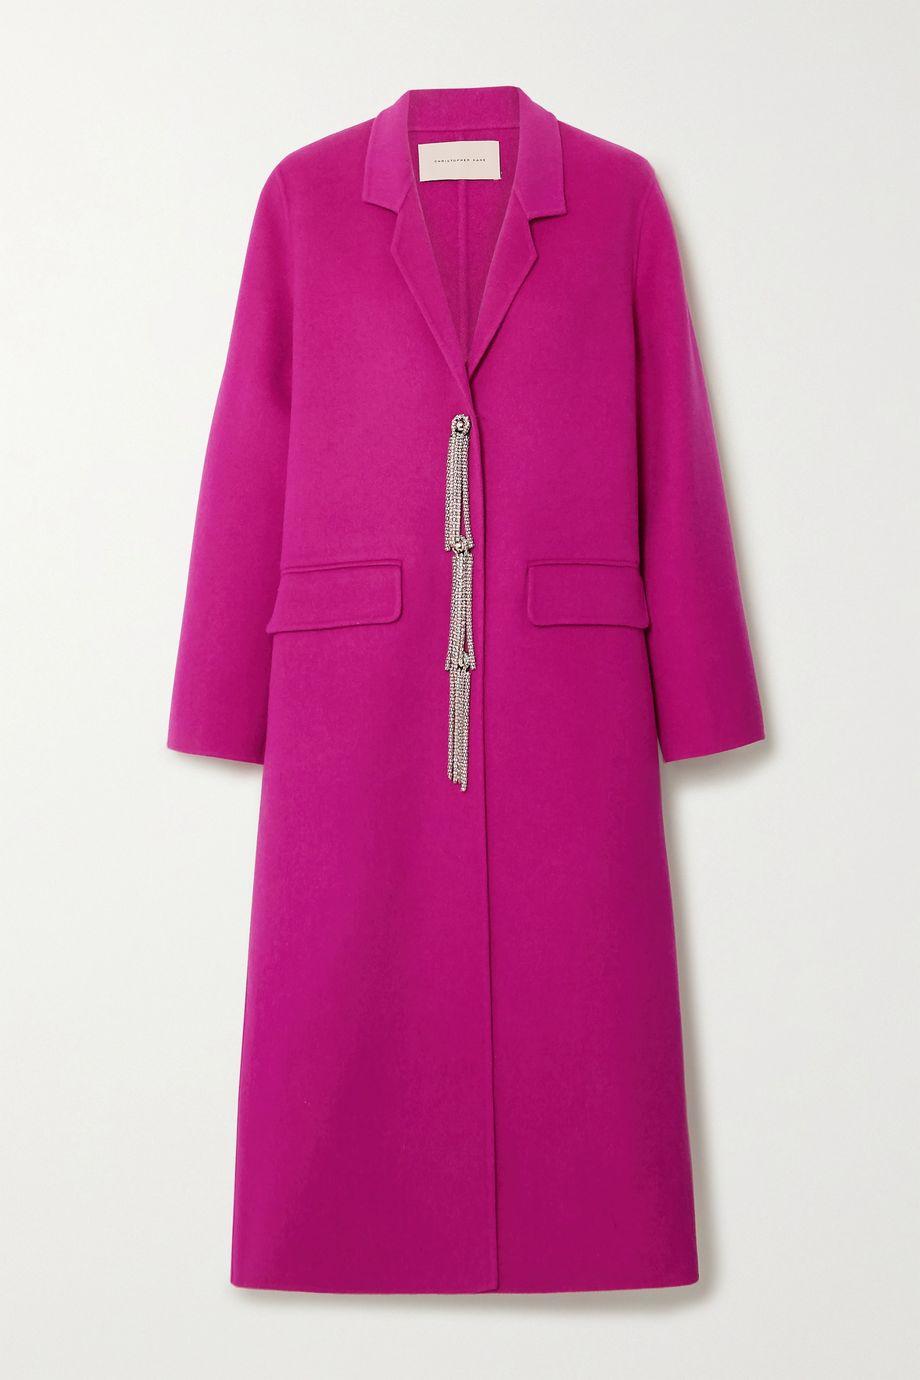 Christopher Kane Embellished wool coat